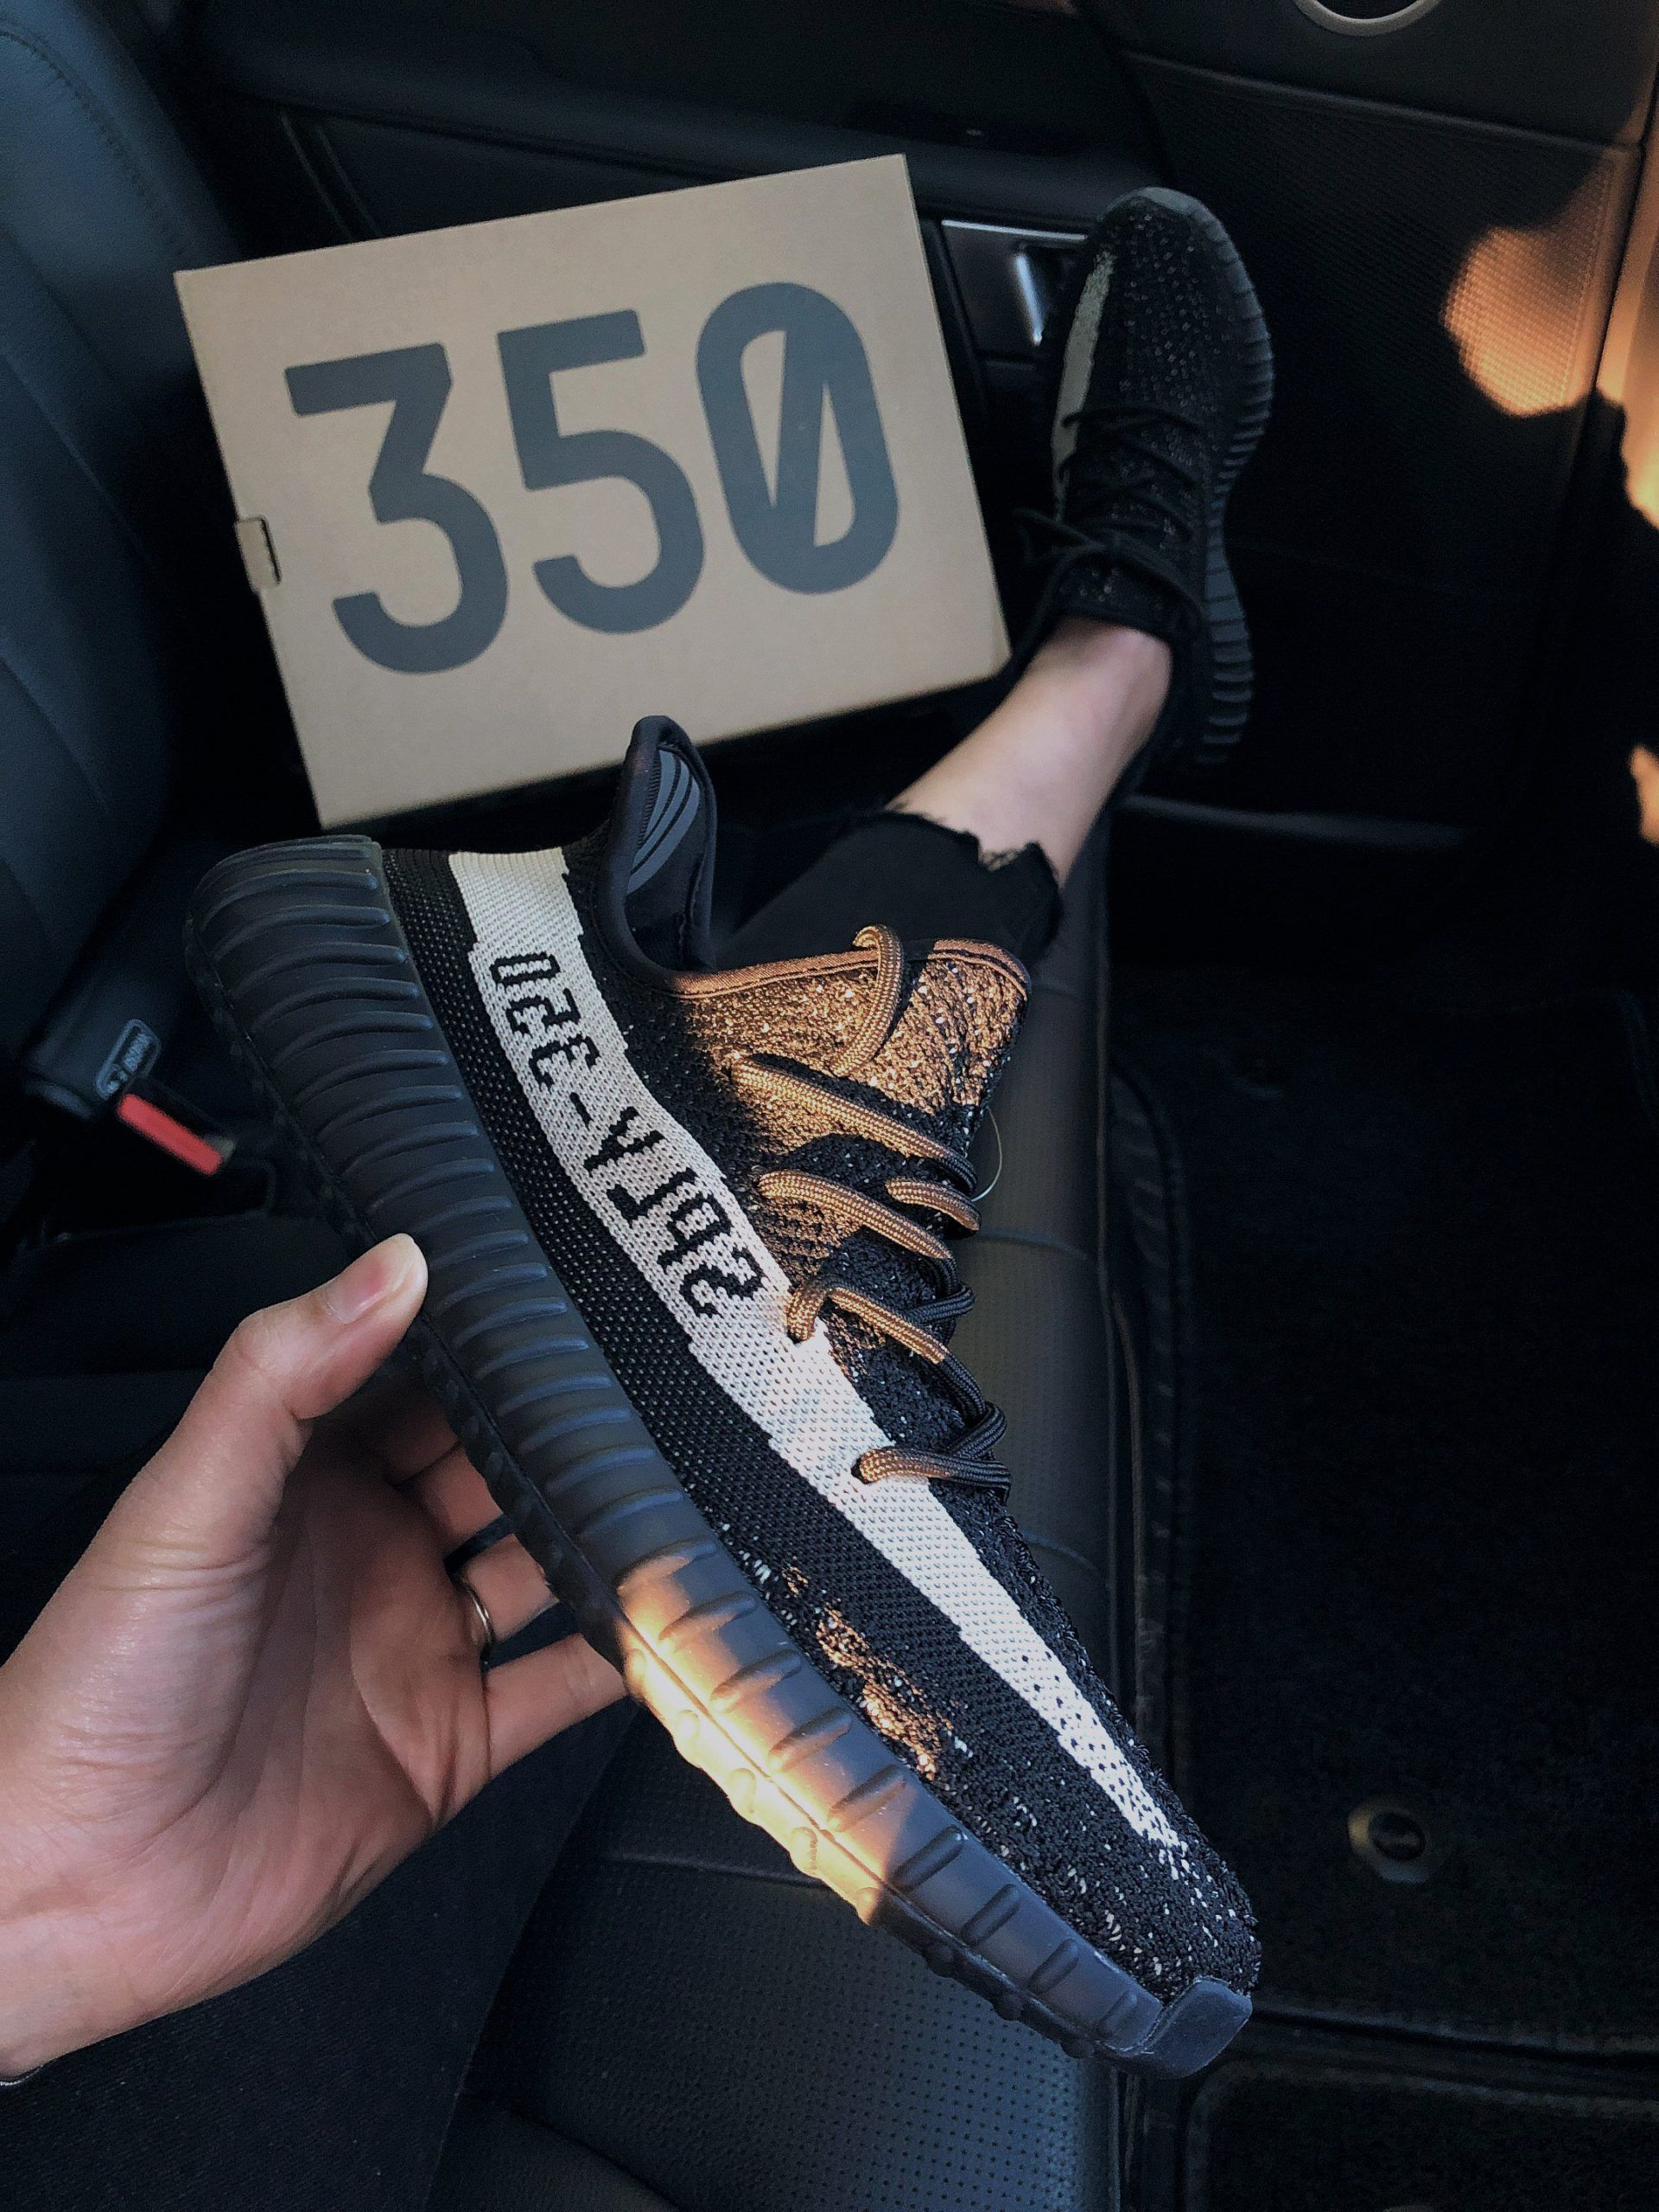 Adidas Yeezy Boost 350 V2 'Oreo' BY9612